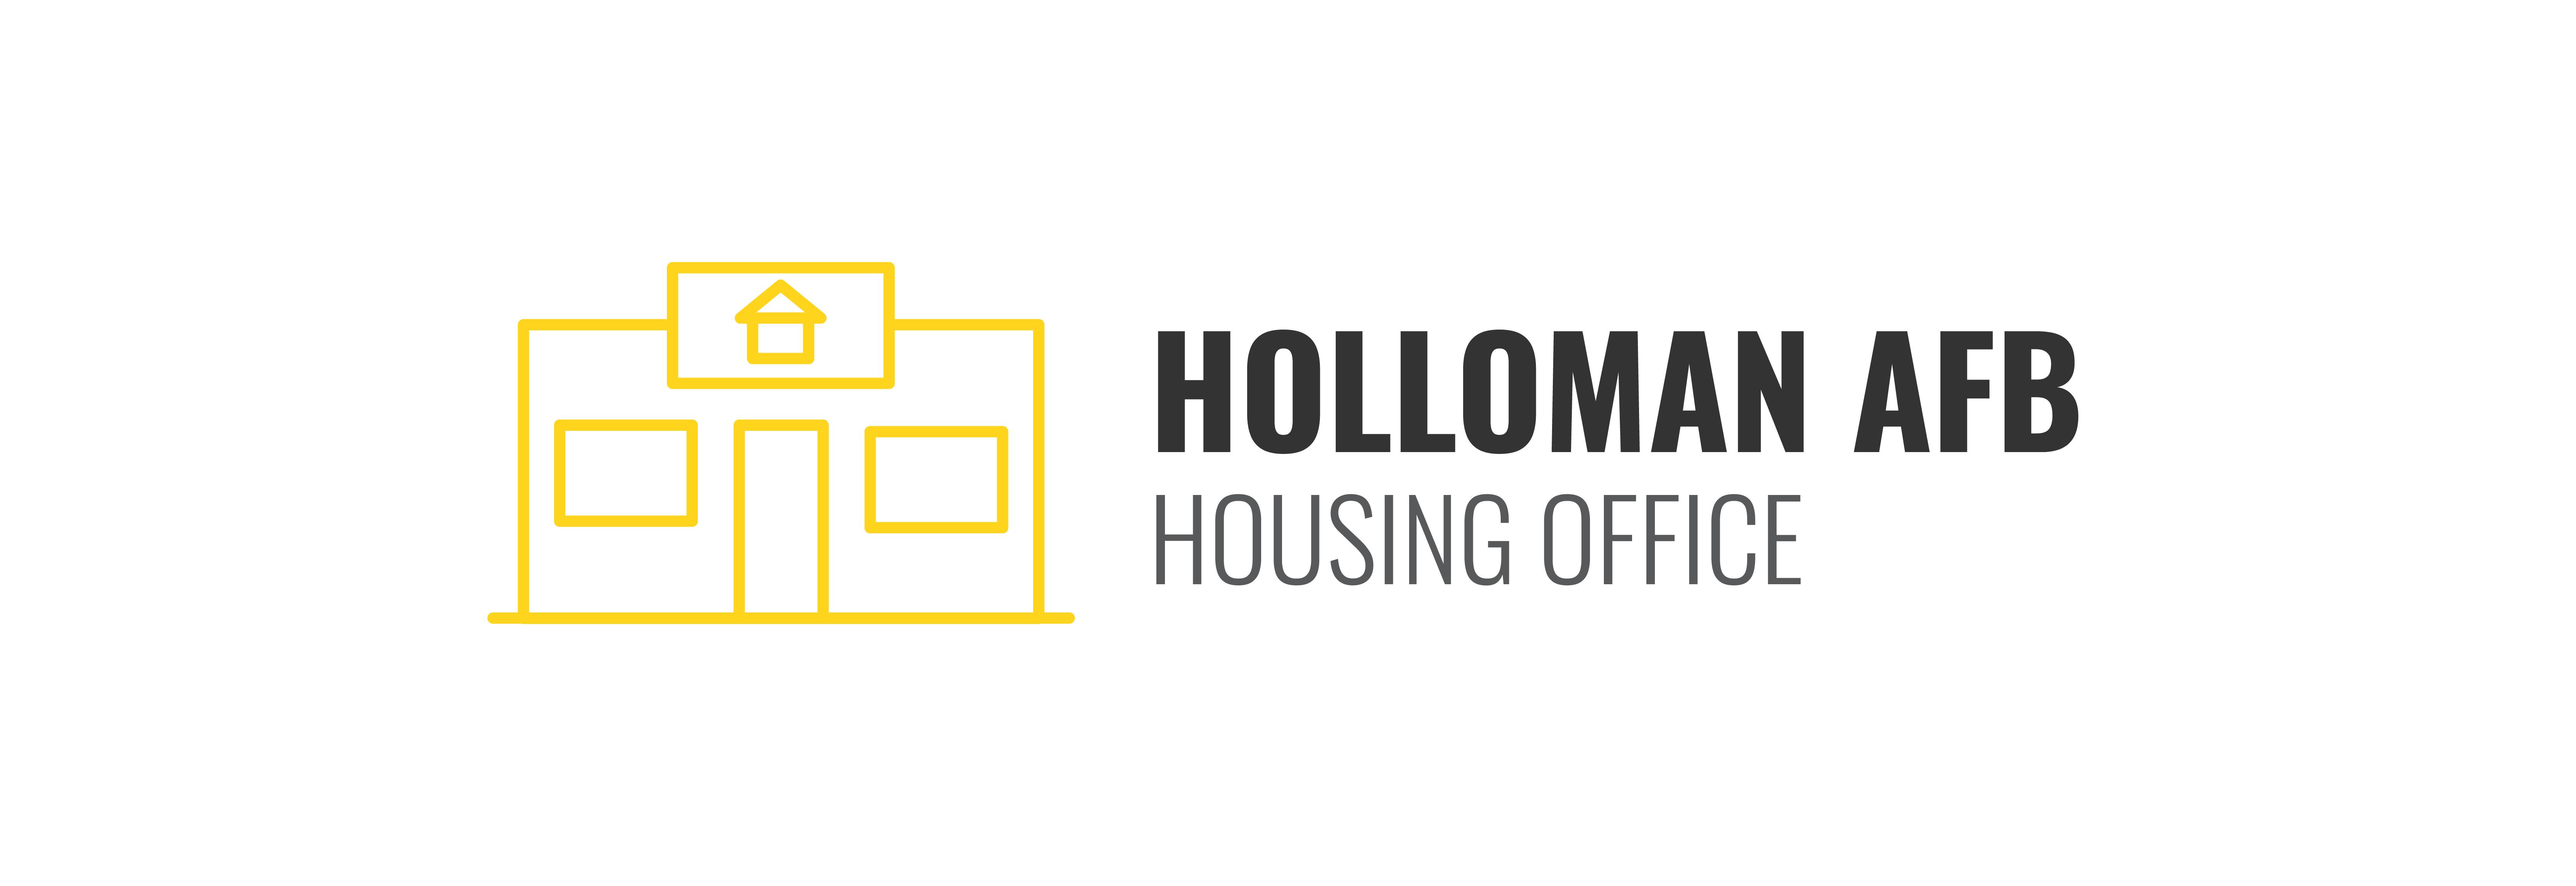 Holloman AFB Housing Office